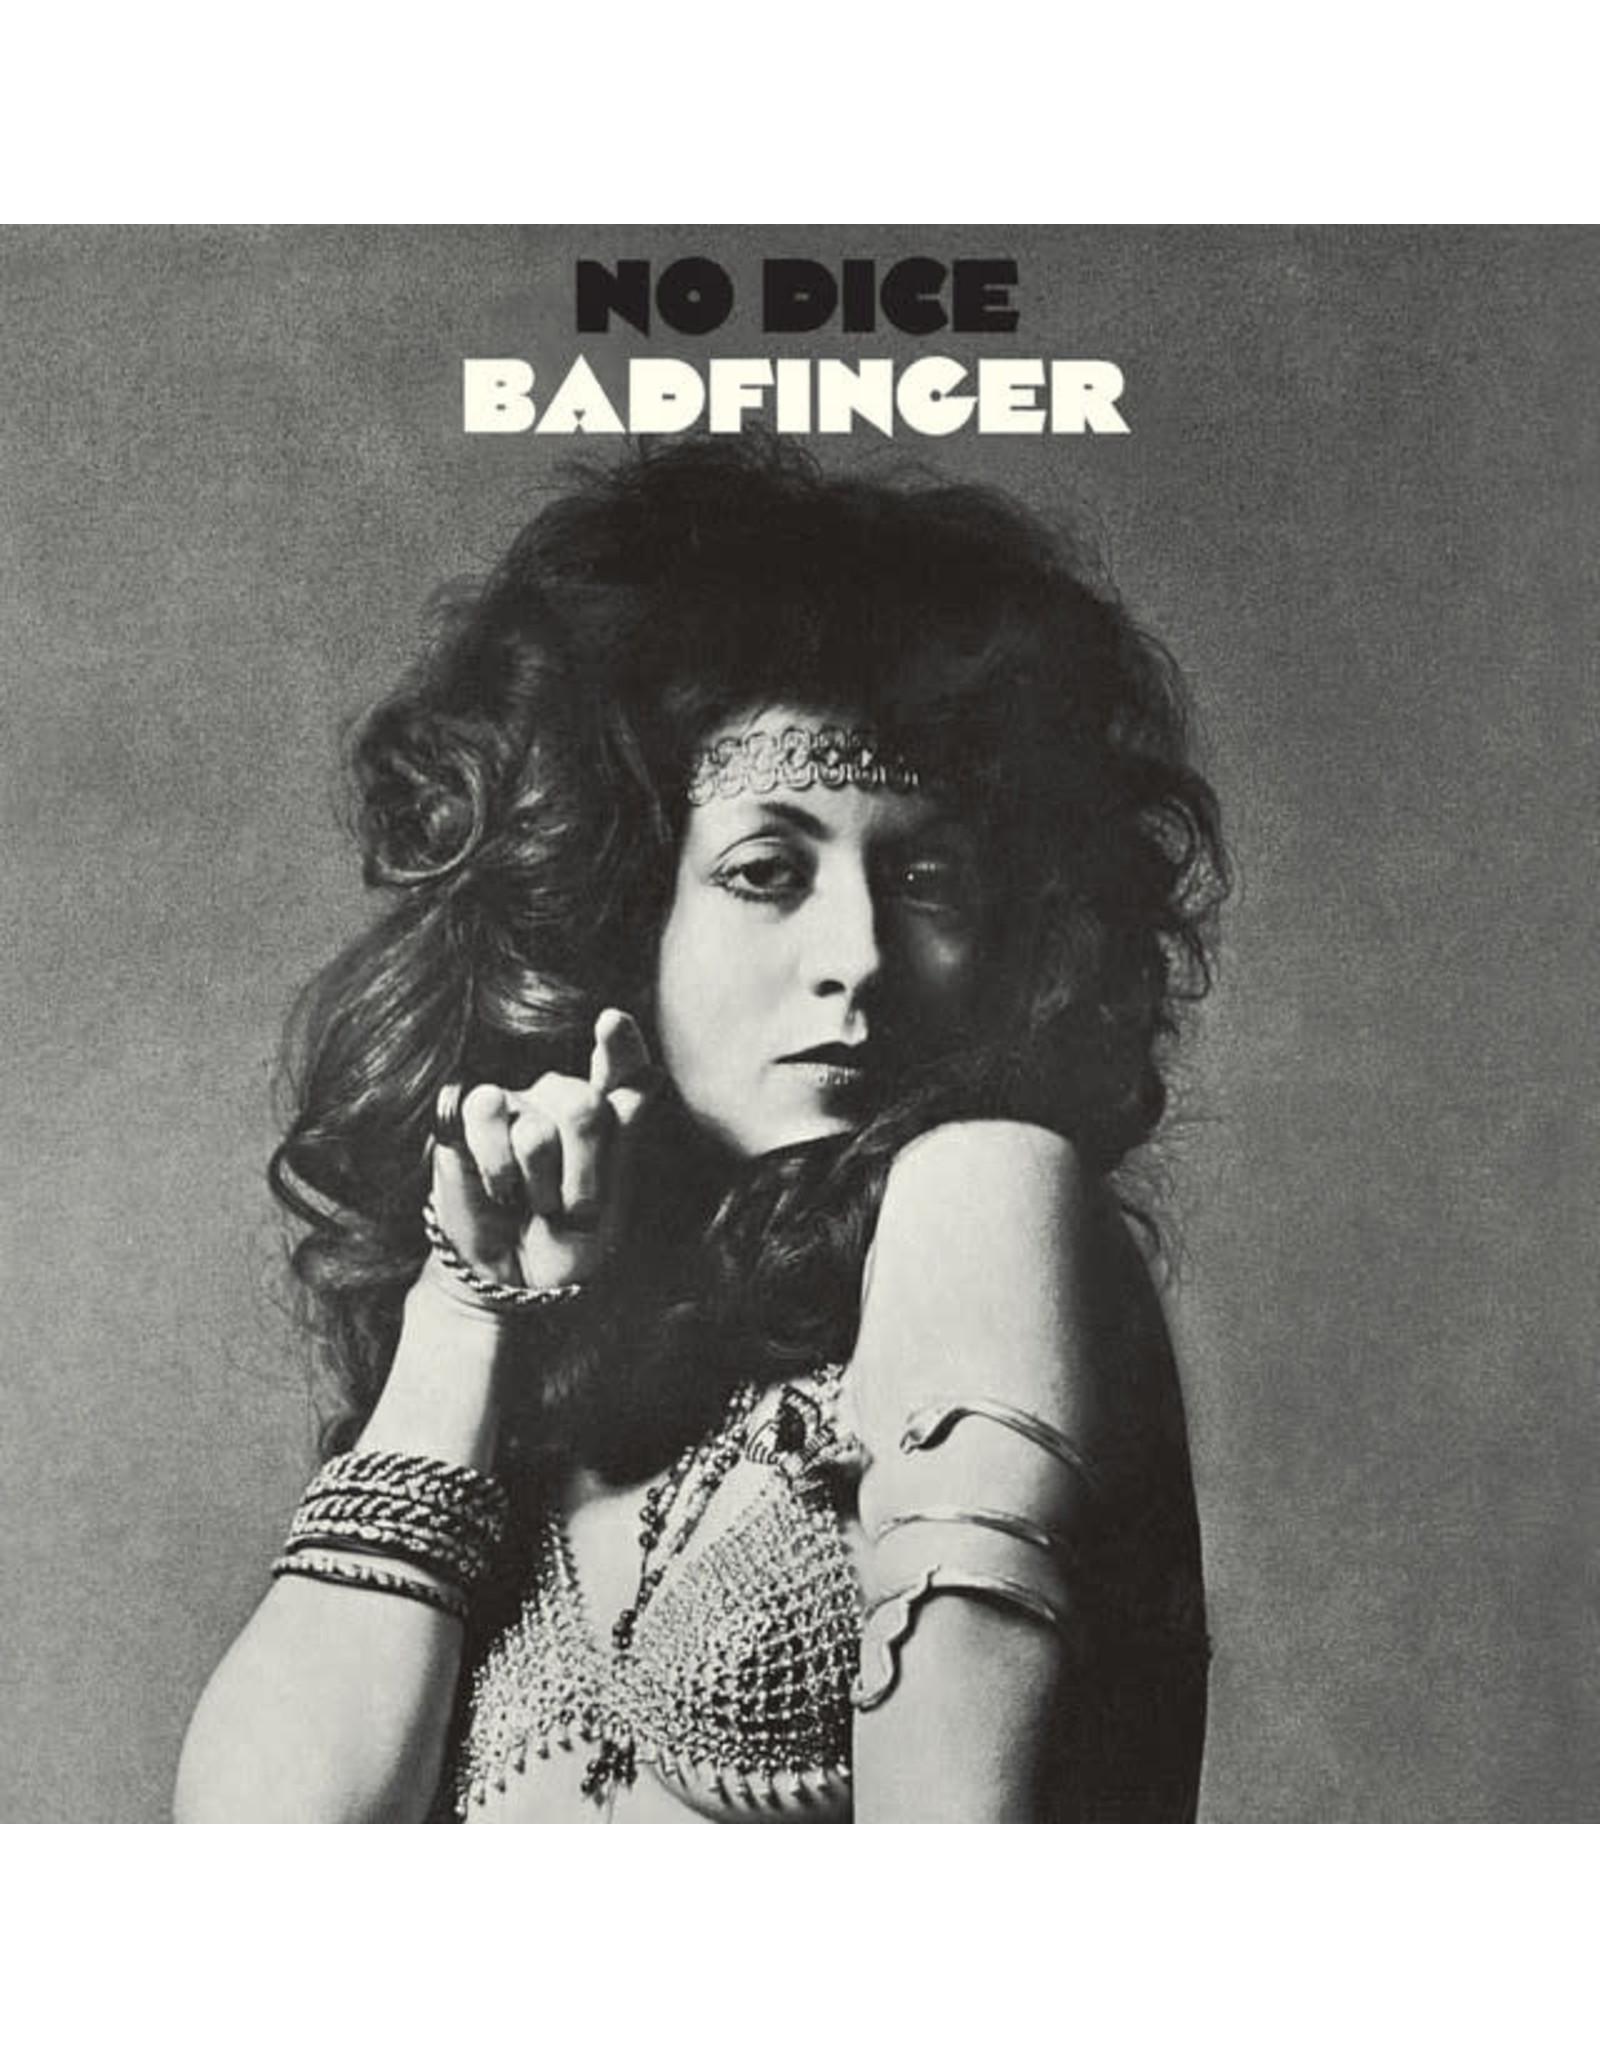 Vinyl Badfinger - No Dice (Apple 1971)